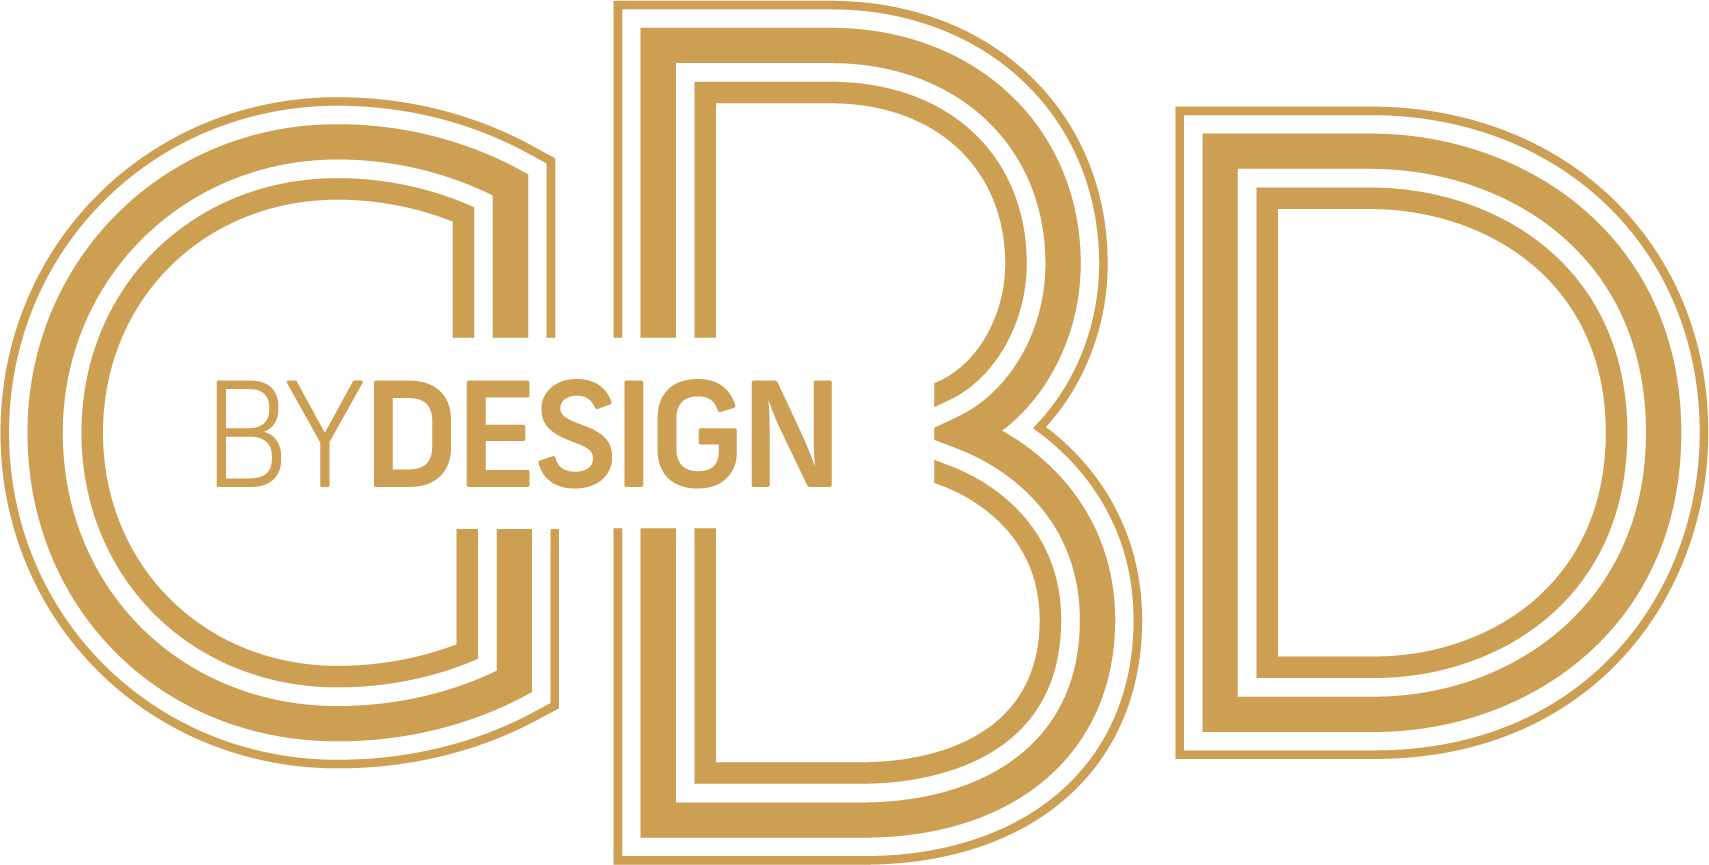 CBD by Design